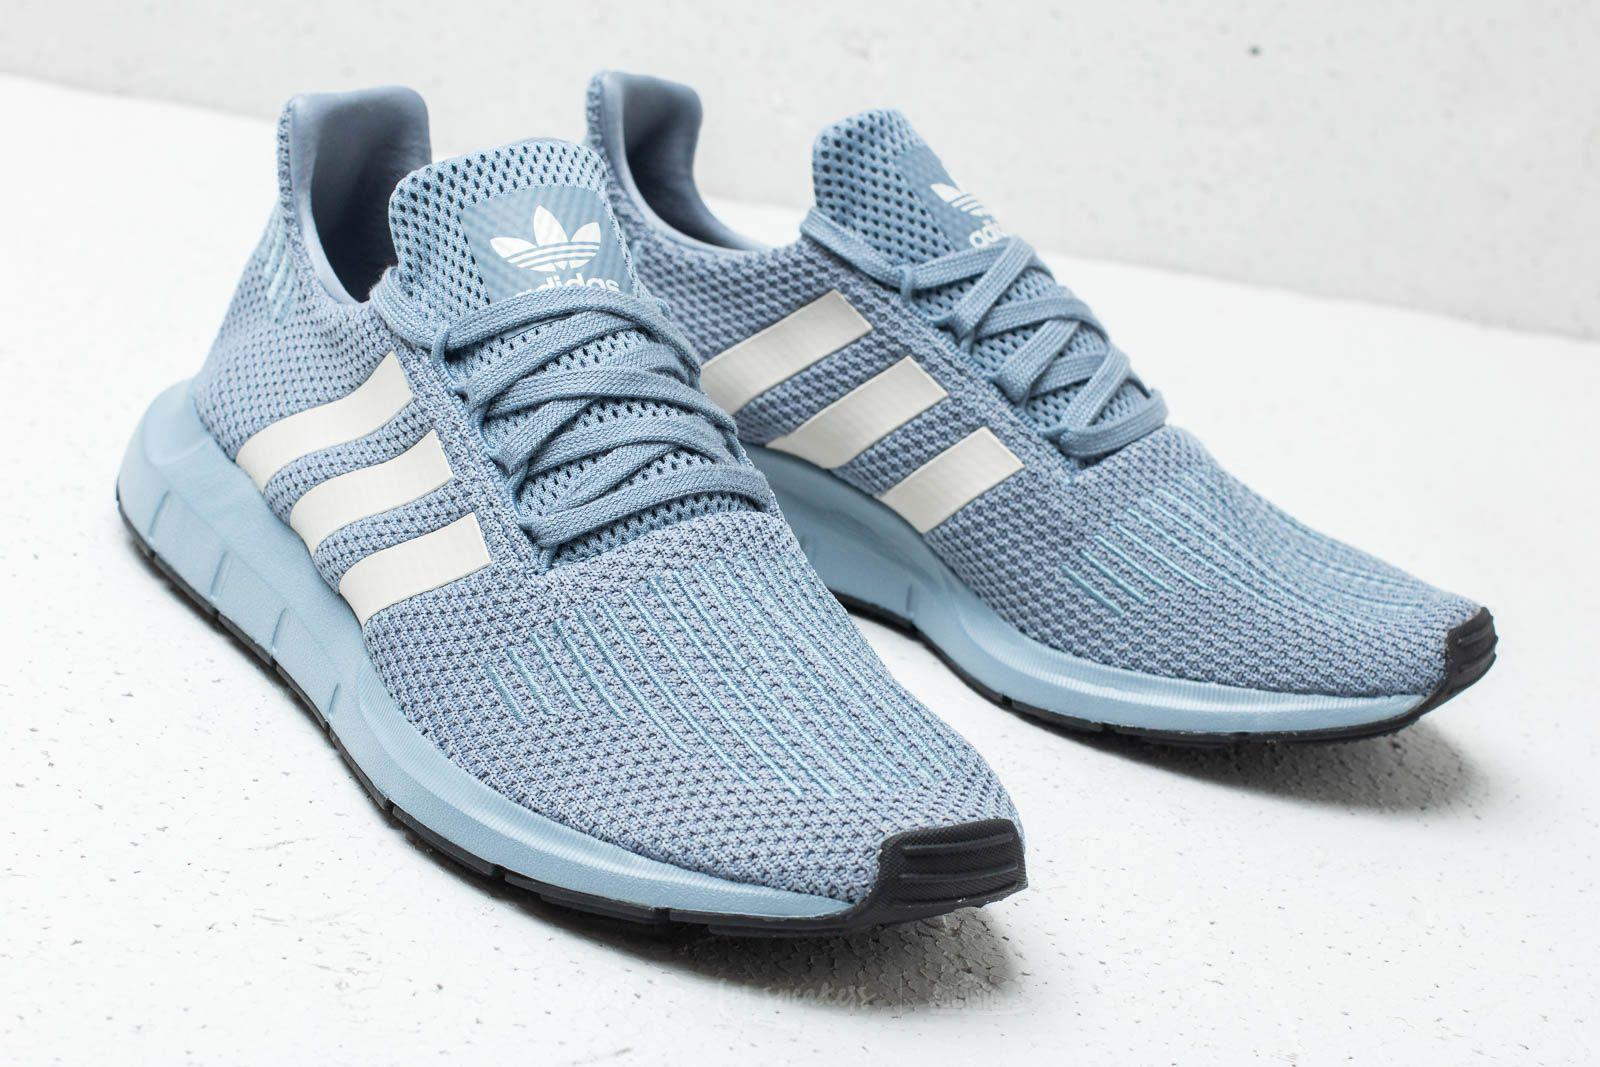 d4187669c588 Lyst - adidas Originals Adidas Swift Run Raw Grey  Chapea  Core ...